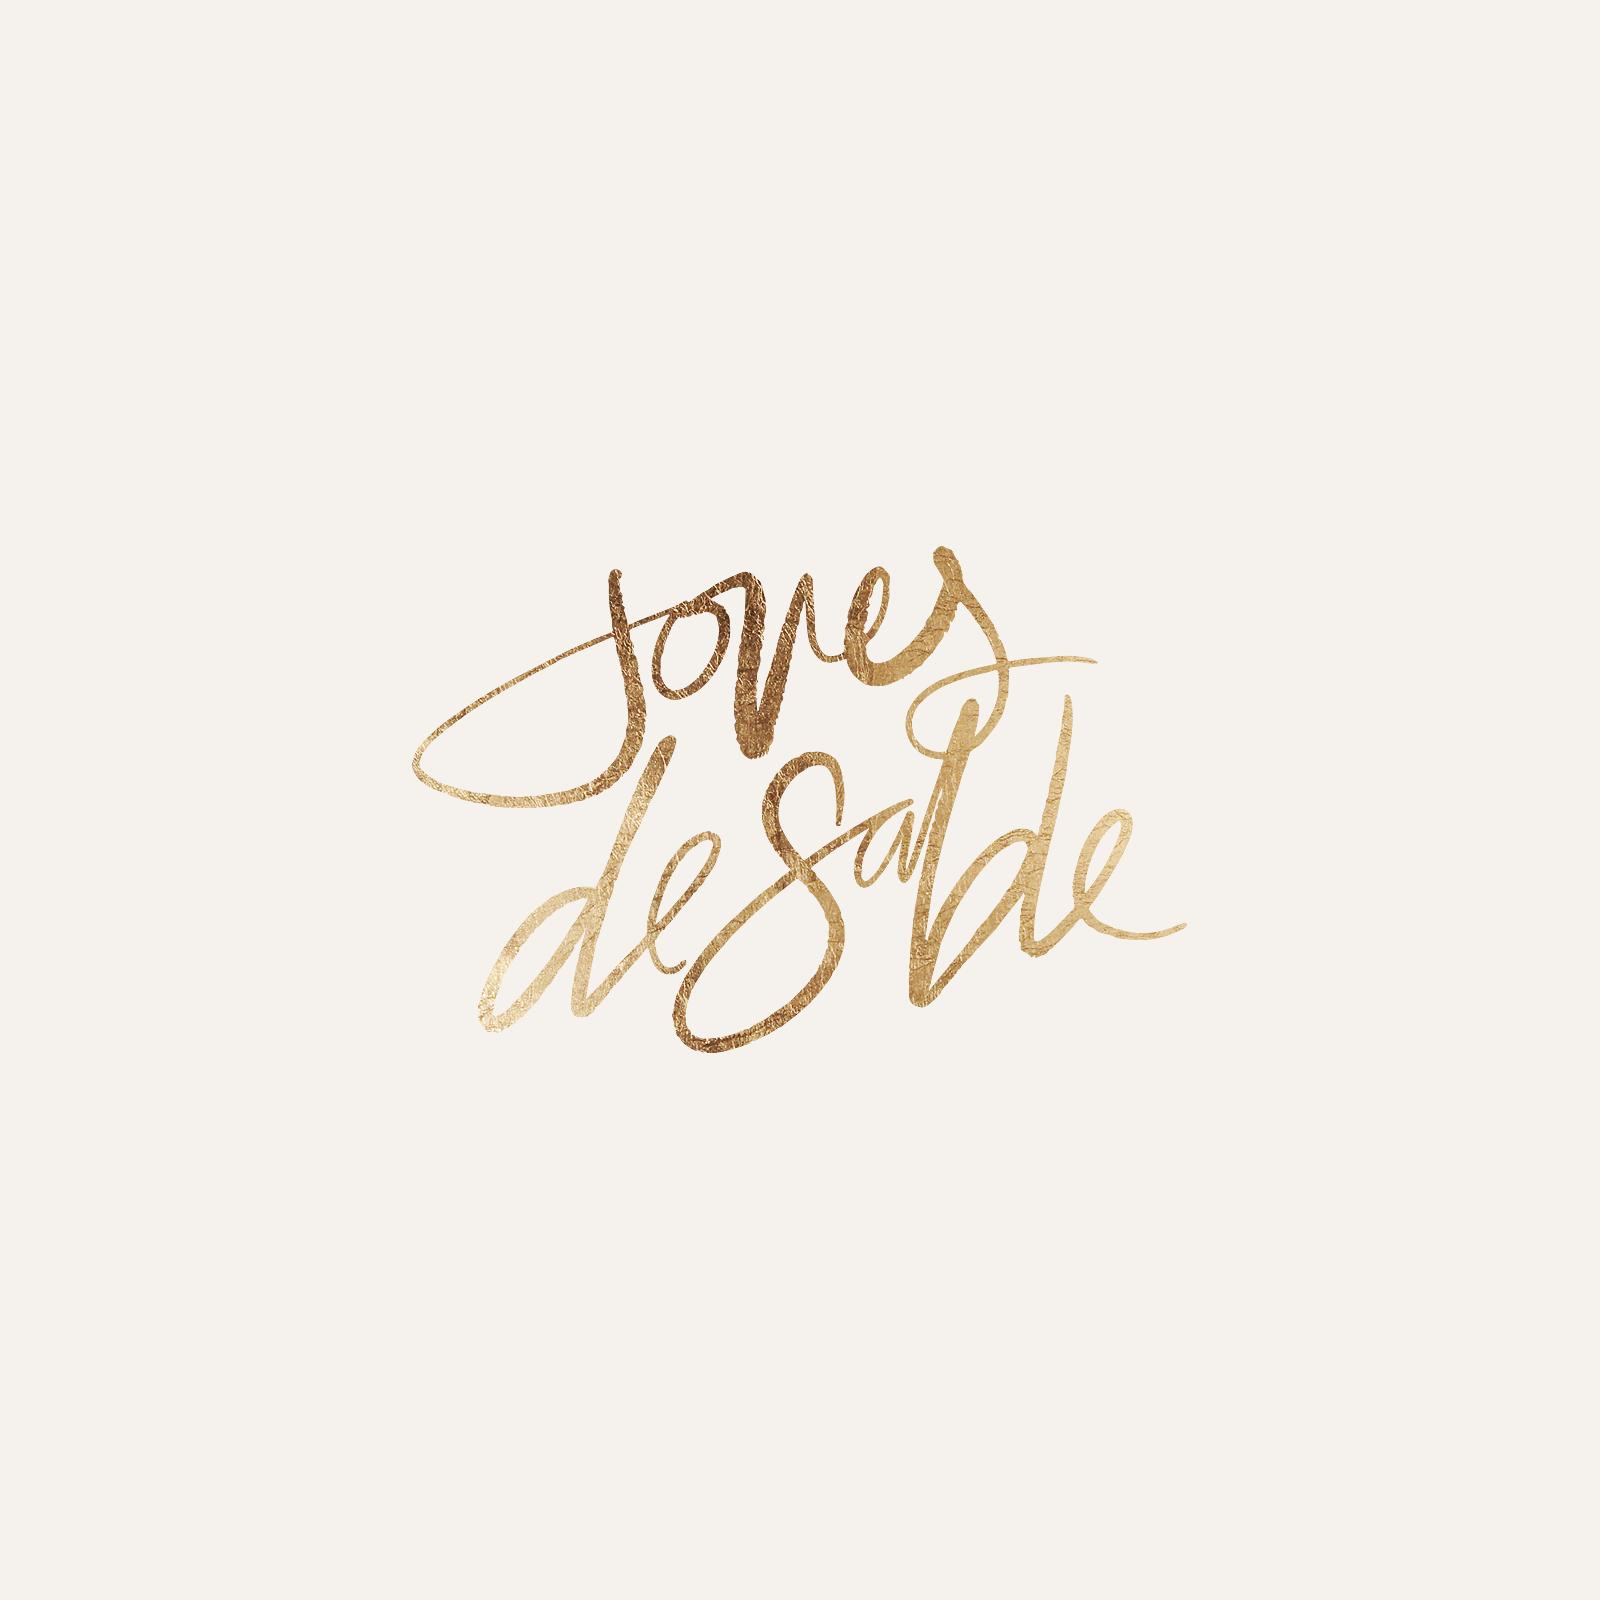 new in portfolio / joues de sable